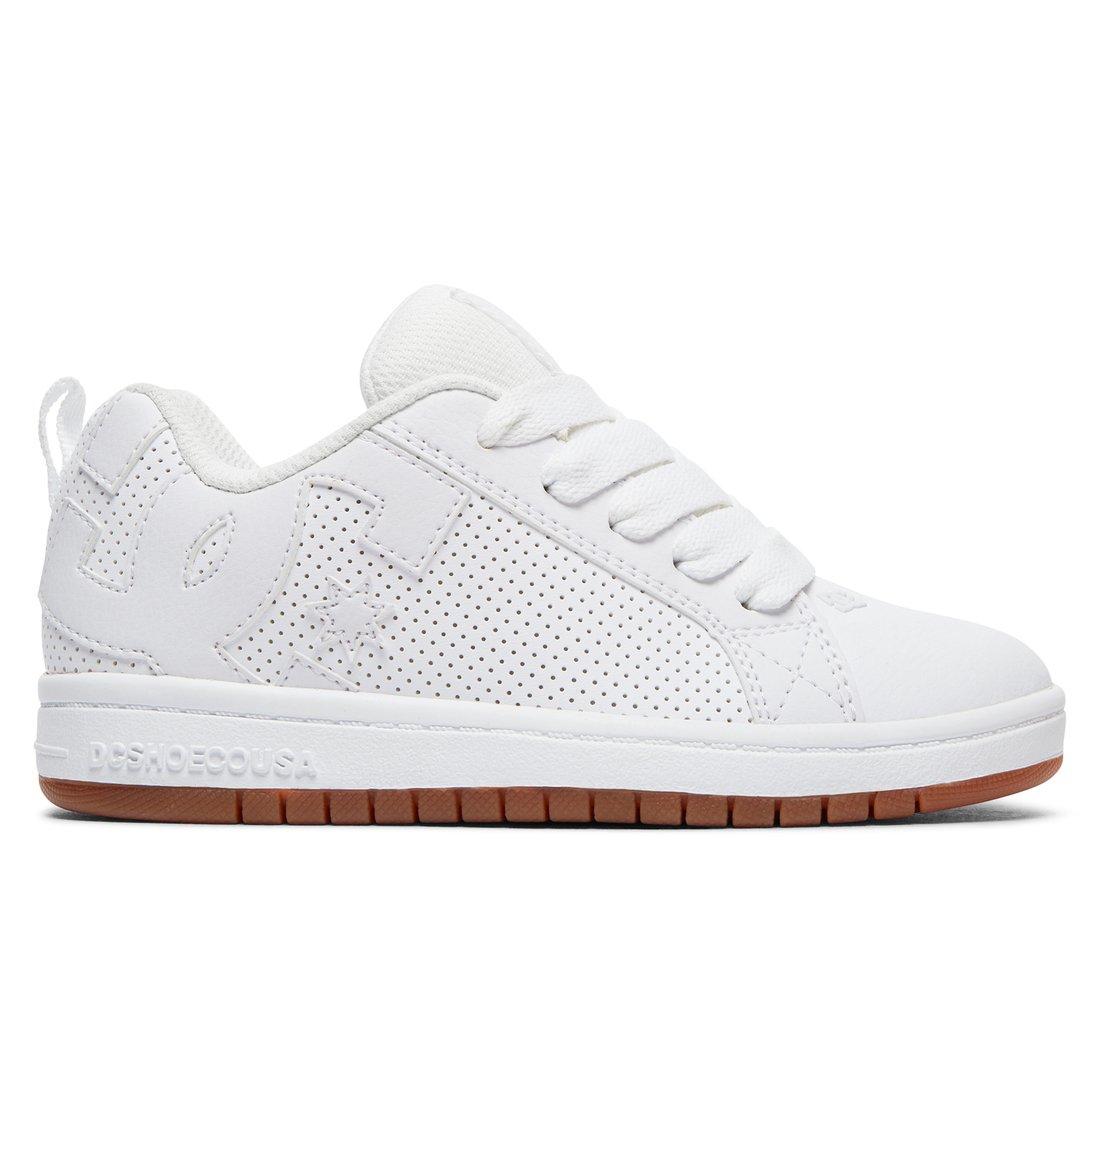 DC Shoes Meridian - Shoes - Baskets - Homme - US 7/UK 6/EU 39 - Blanc